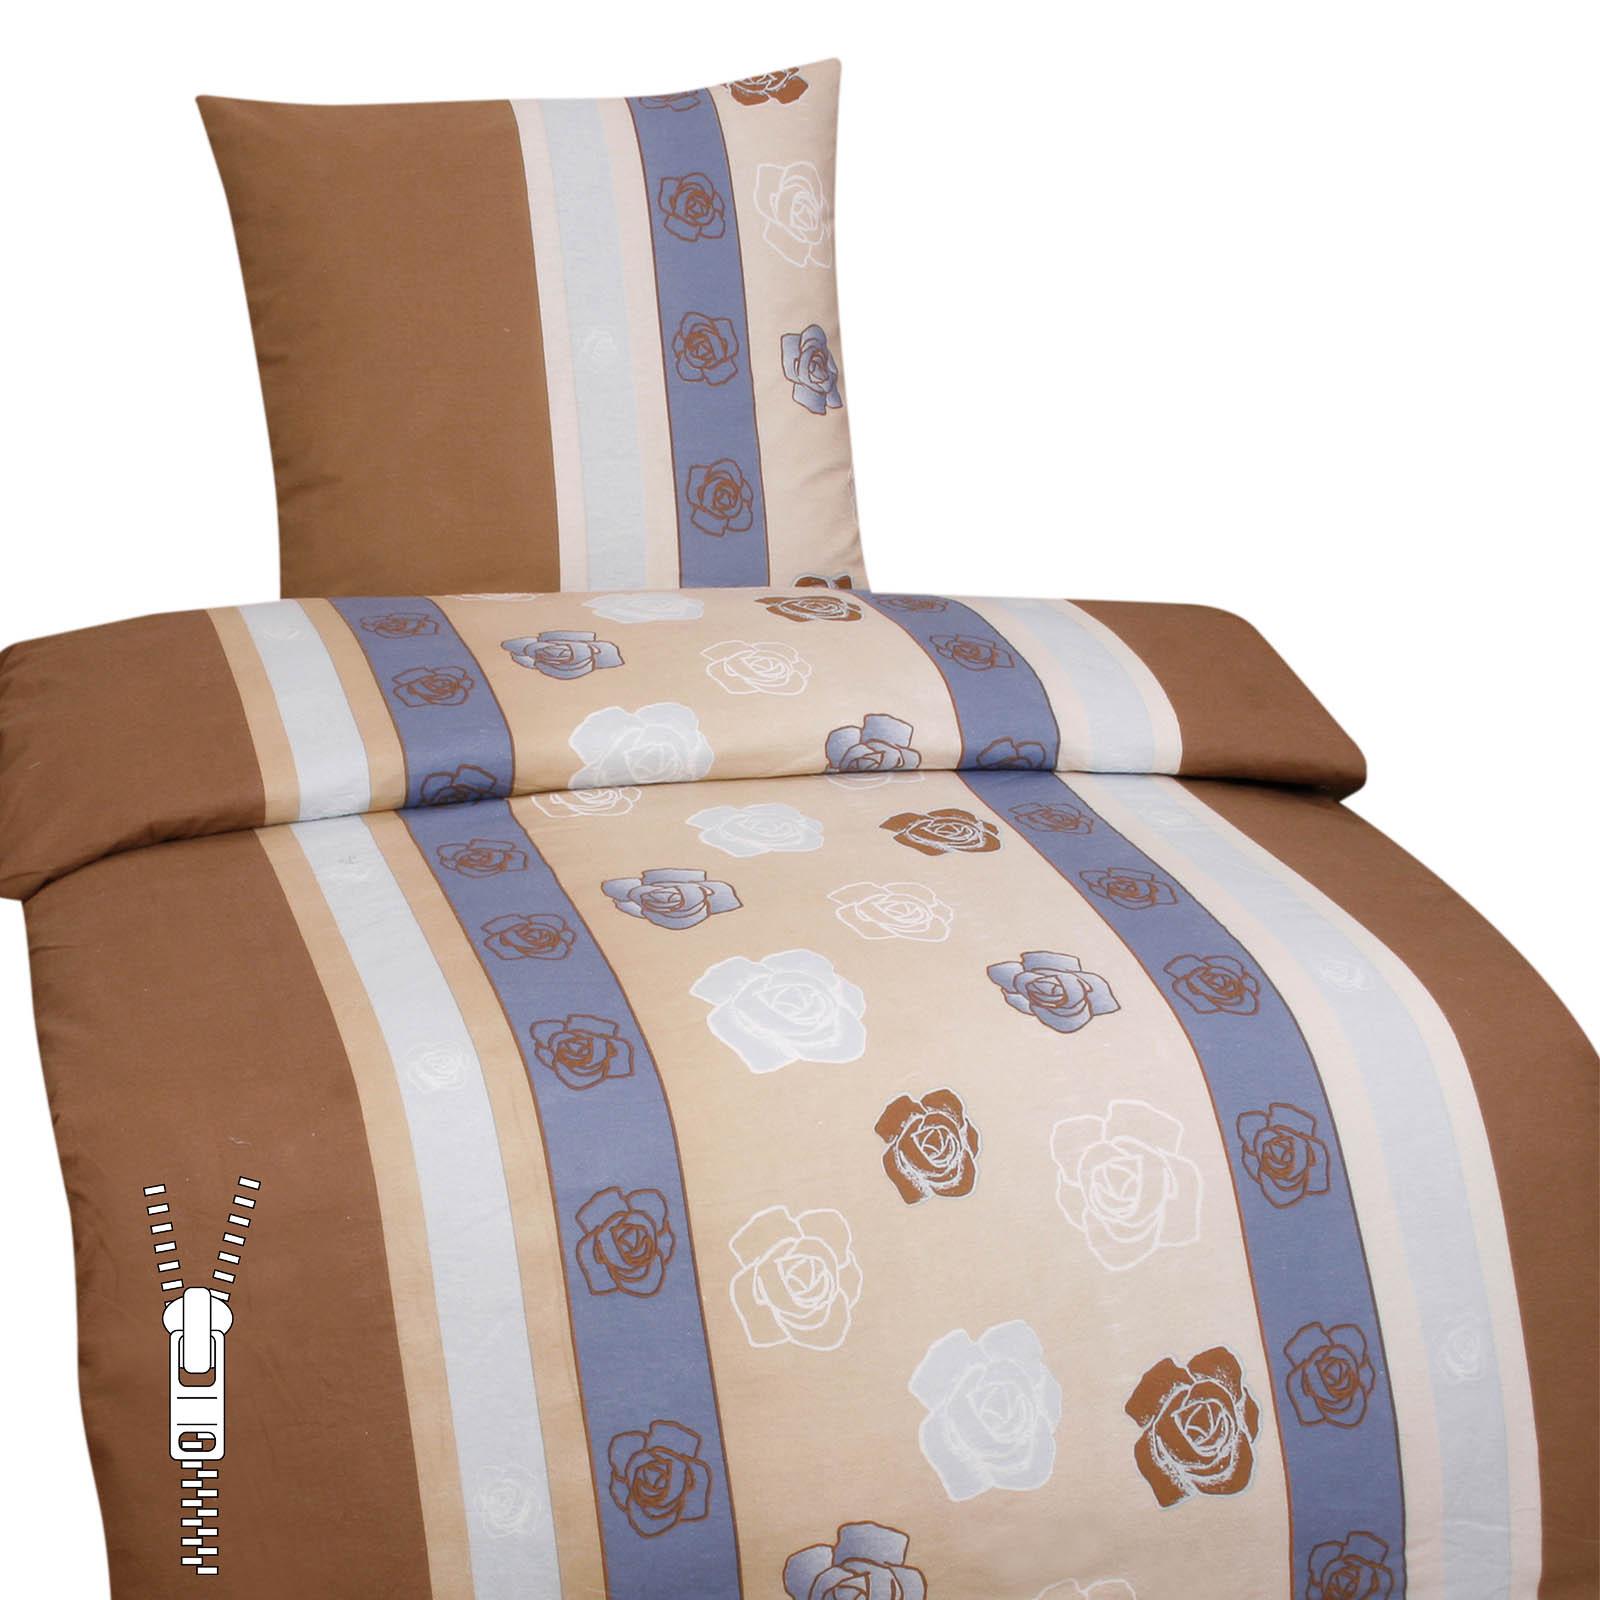 feinbiber bettw sche 135x200cm 80x80cm in verschiedenen. Black Bedroom Furniture Sets. Home Design Ideas